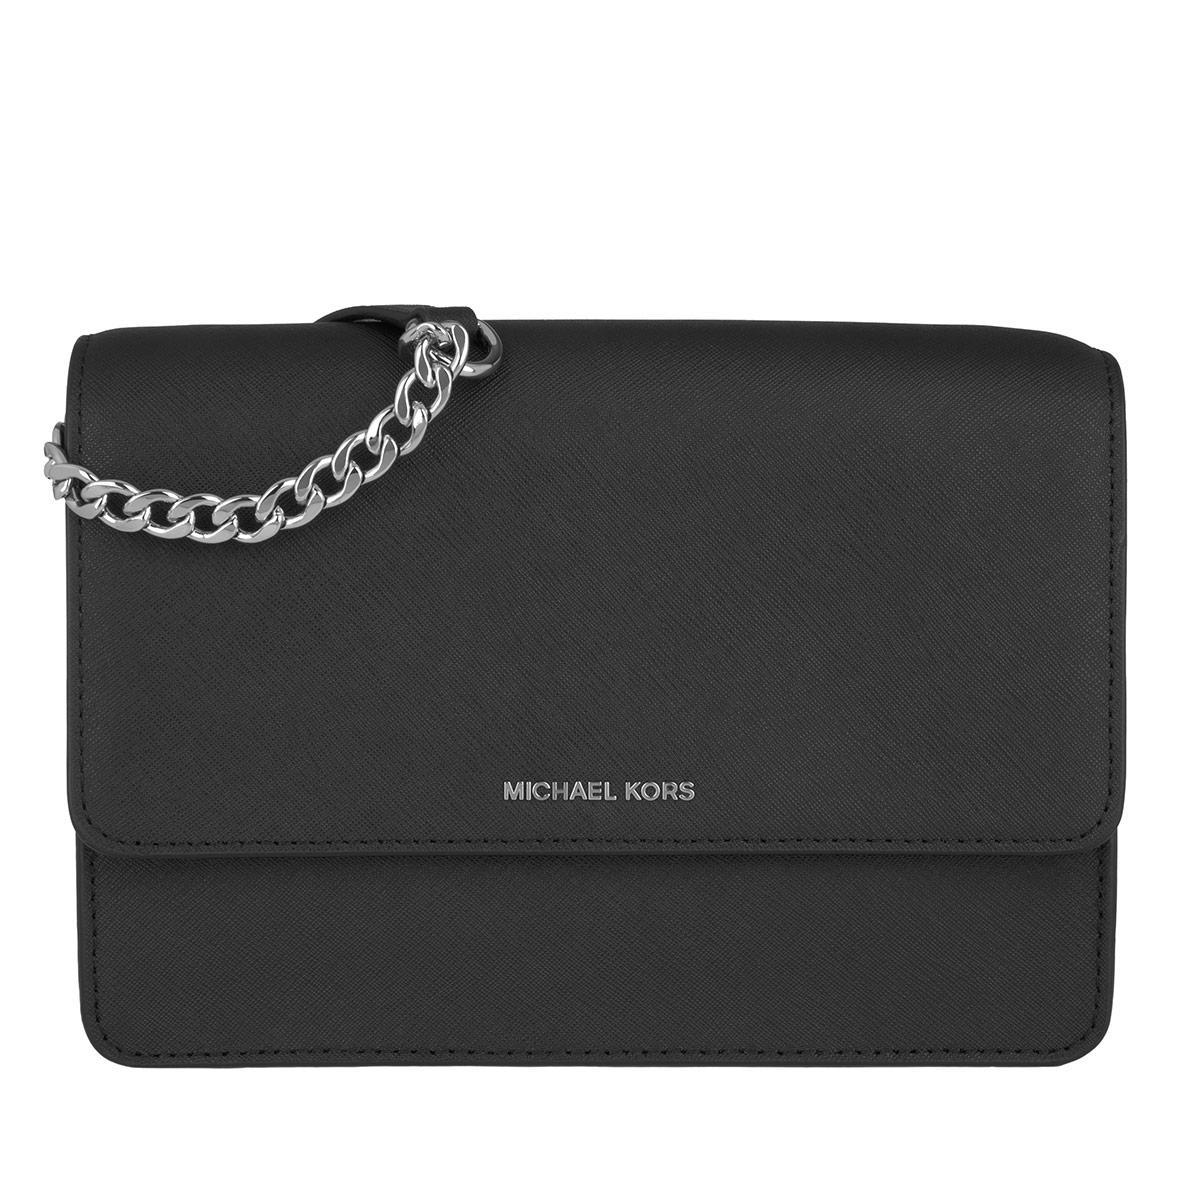 515b9fad479c Michael Kors Daniela Lg Crossbody Bag Leather Black in Black - Lyst